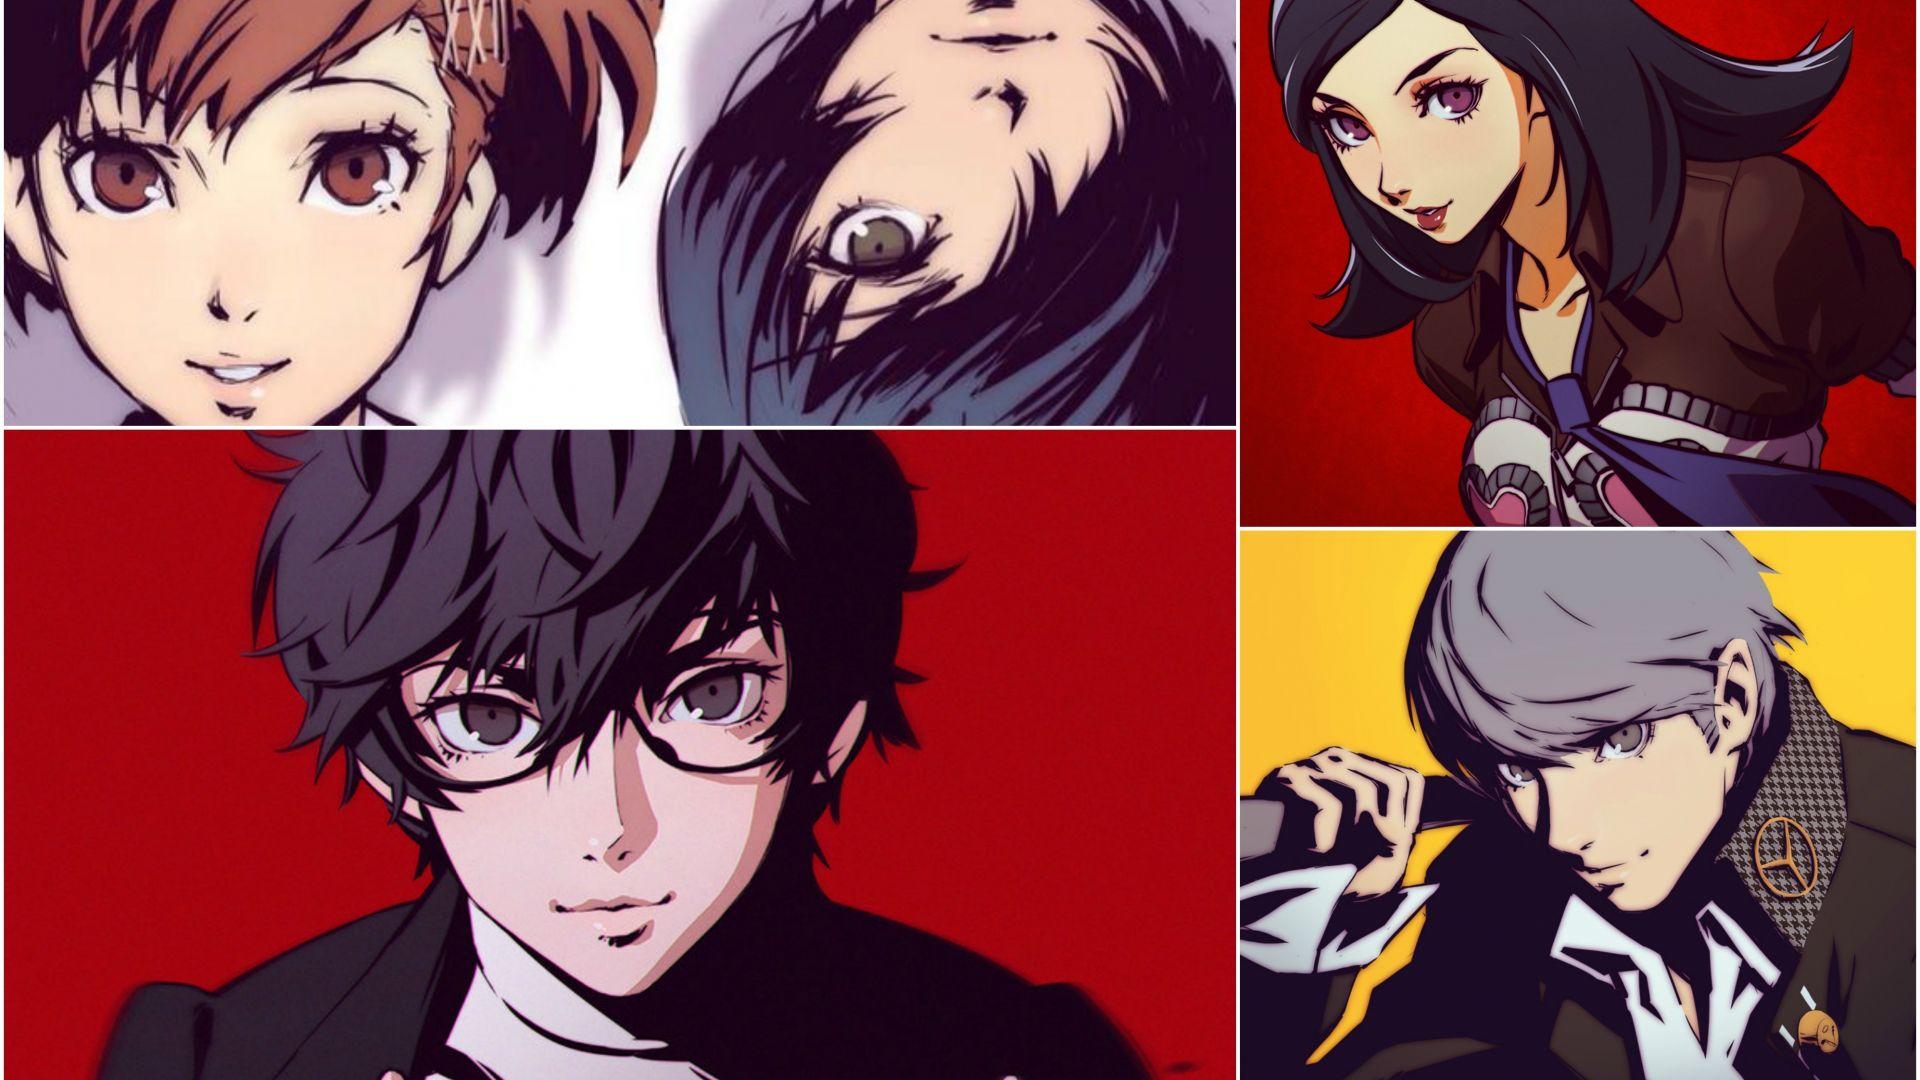 Persona 3 Wallpaper 4k: Desktop Wallpaper Persona 5, Anime, Video Game, 4k, Hd